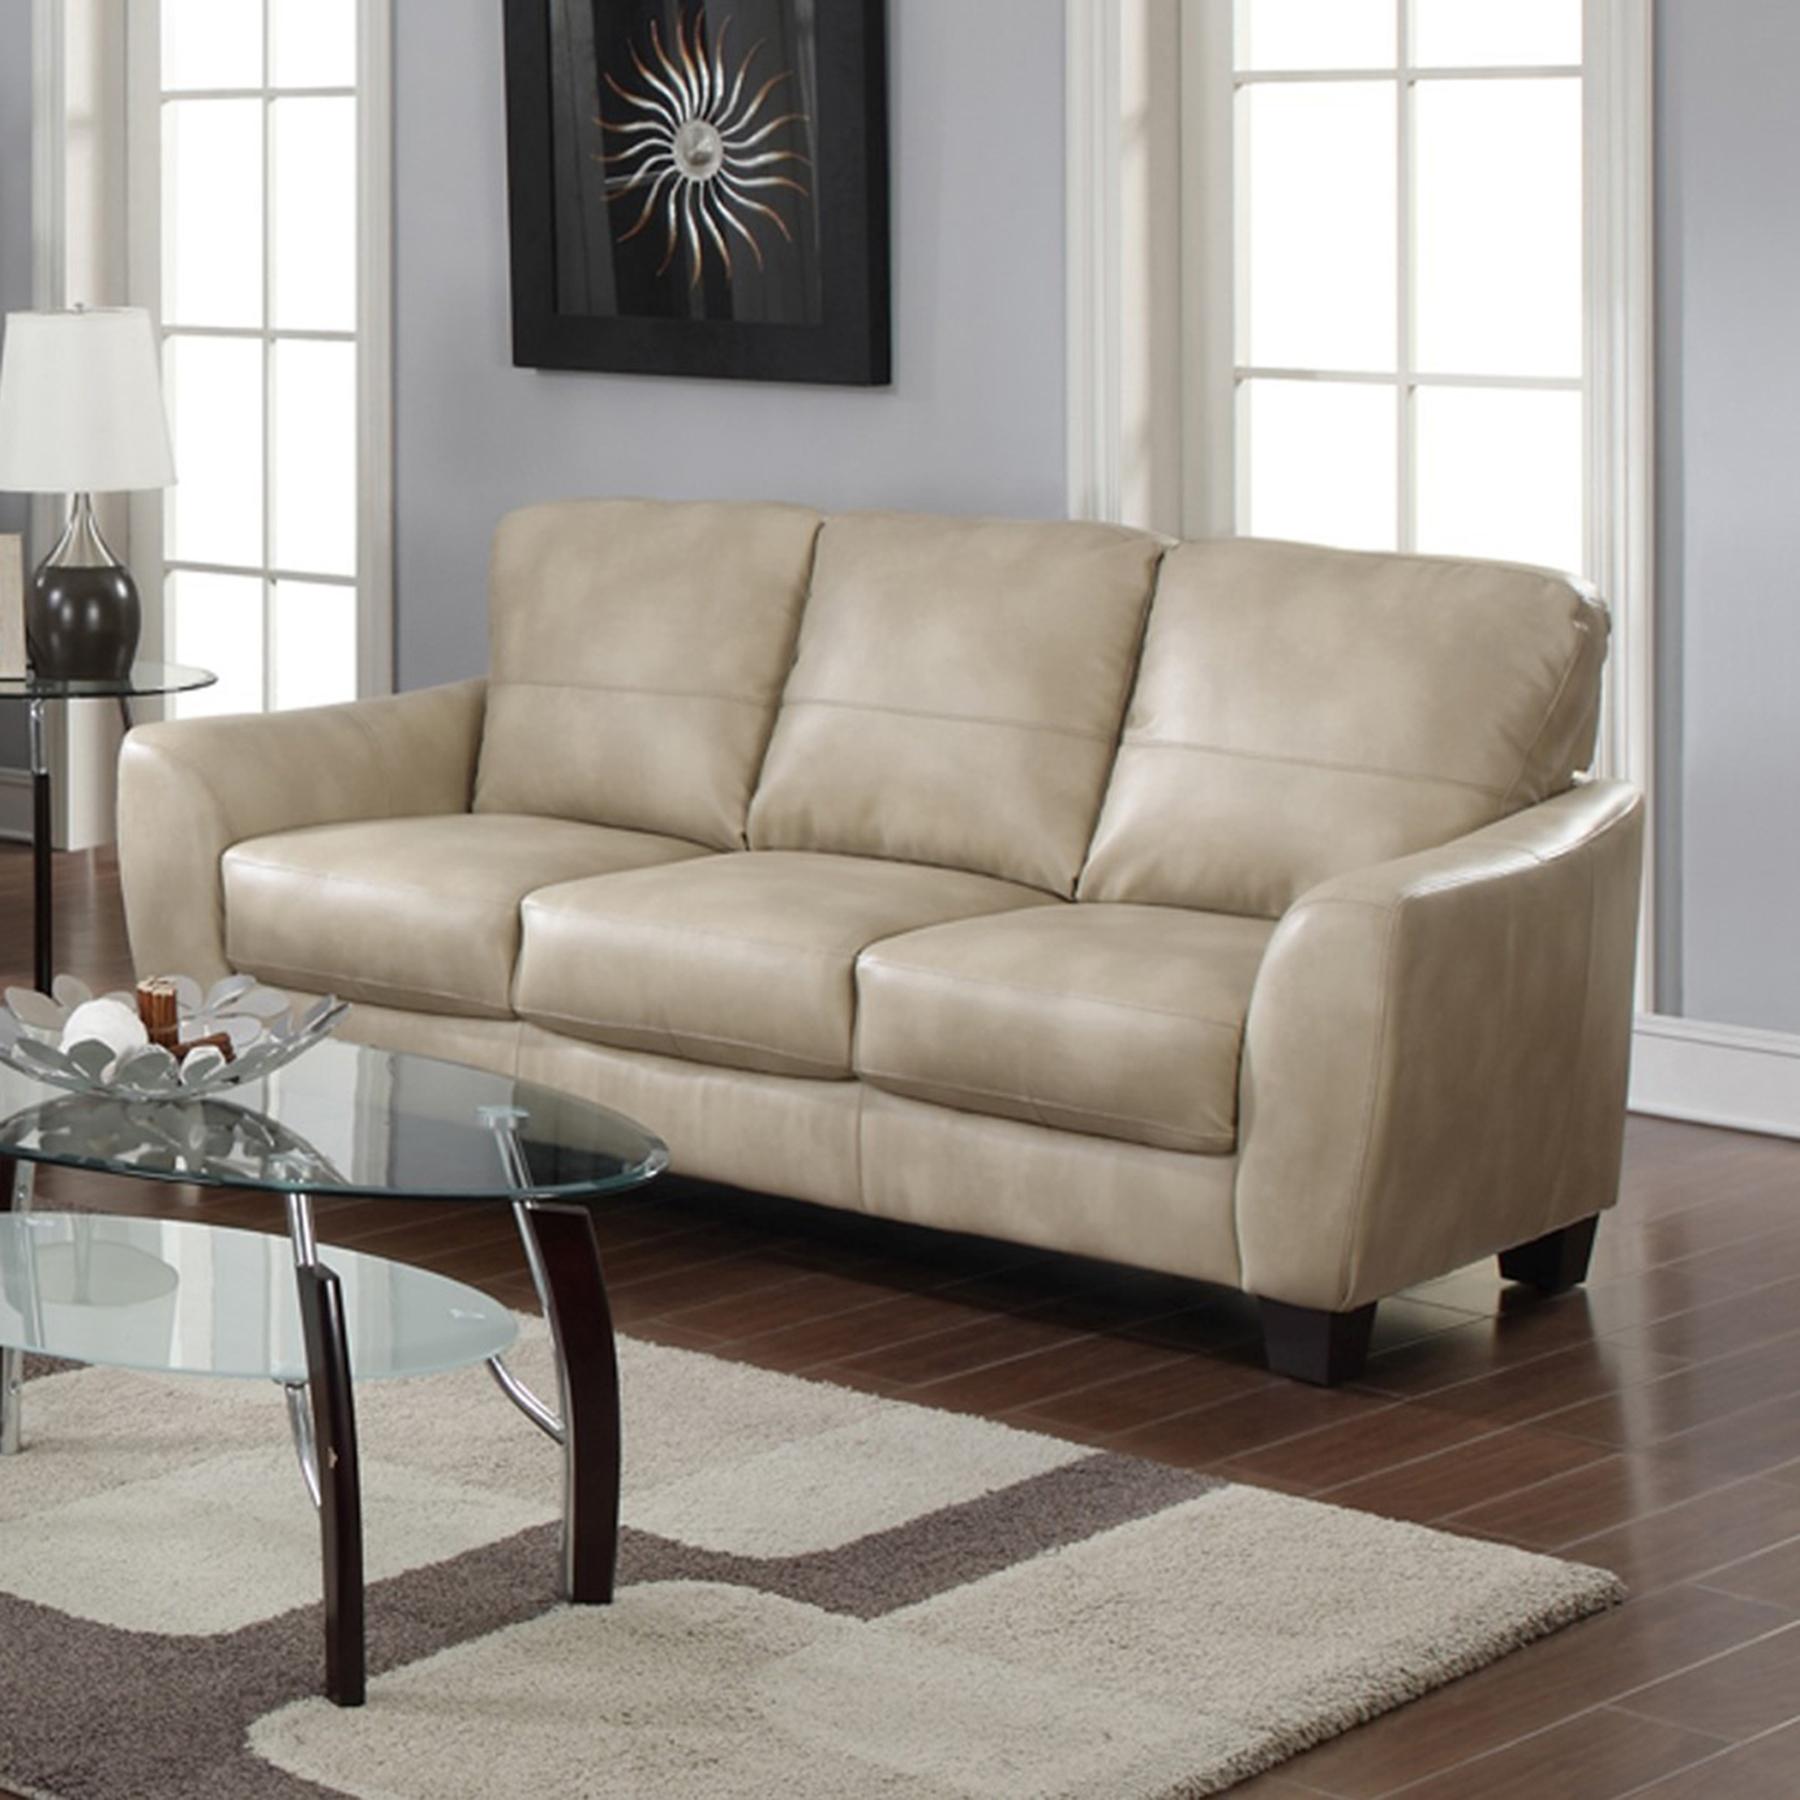 Fremont Bonded Leather Sofa   Taupe   CI FREMONT SFA TPE ...